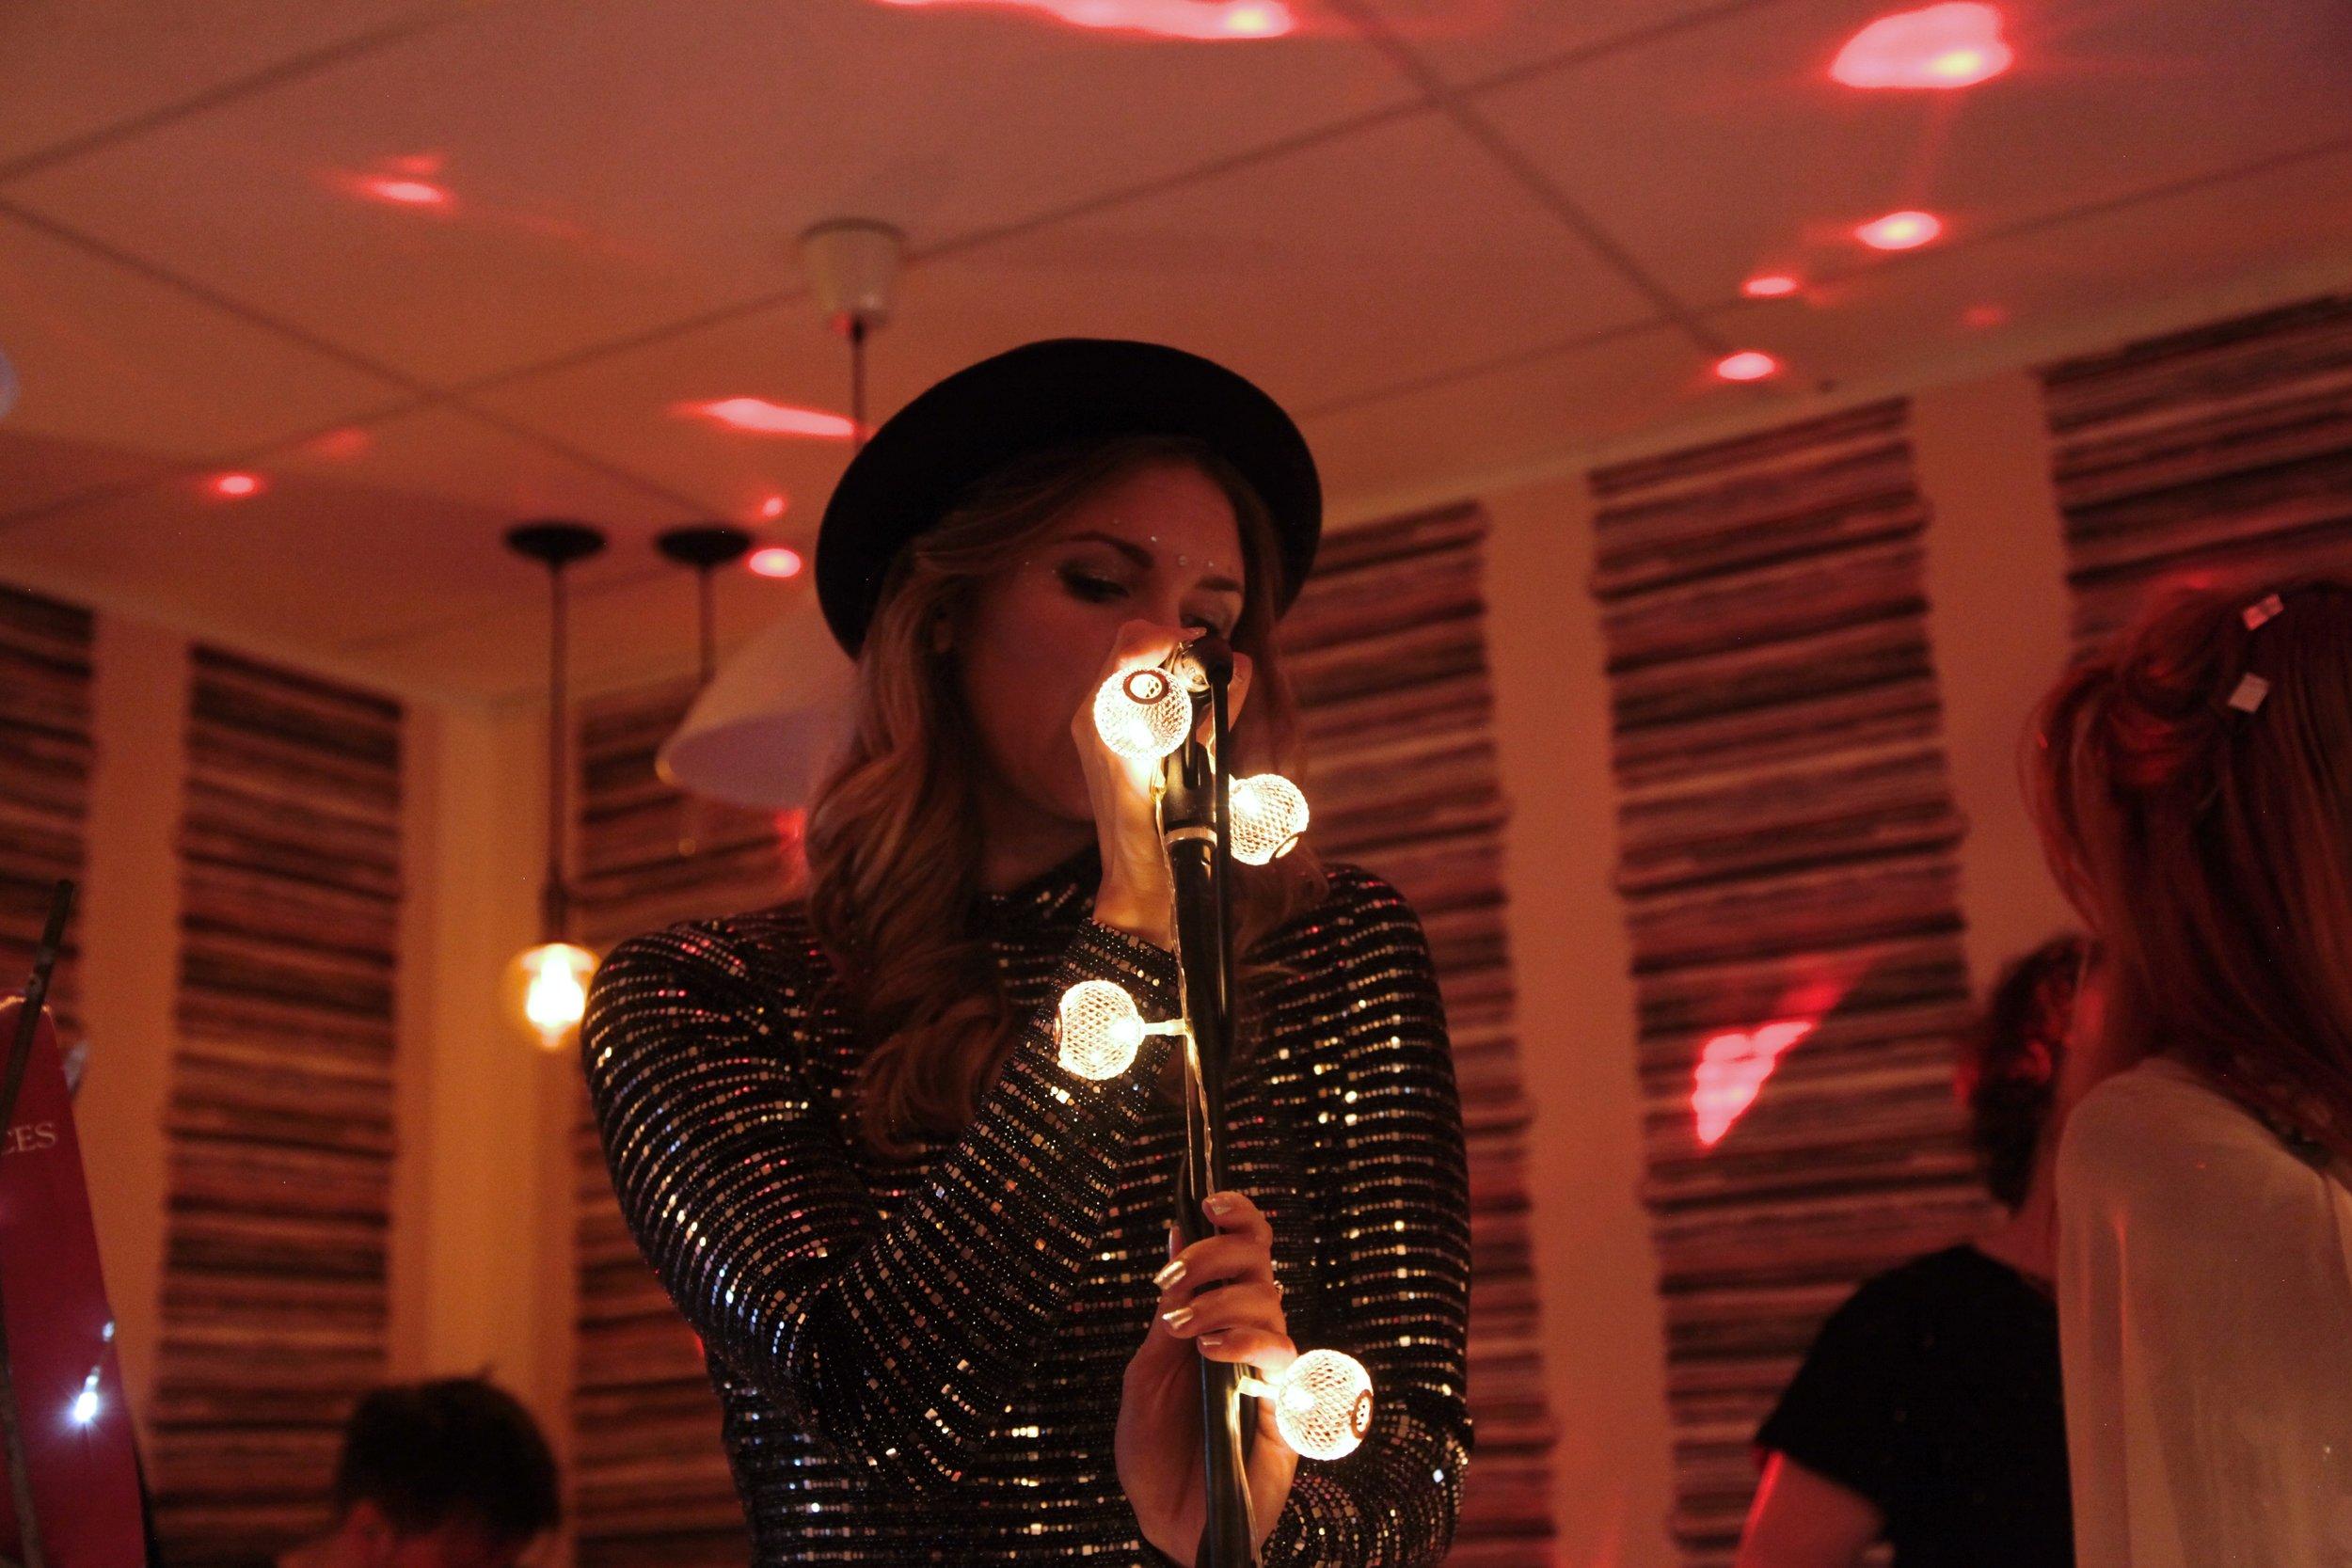 Daisy and the Dark @ Relevant Records Cafe, Cambridge